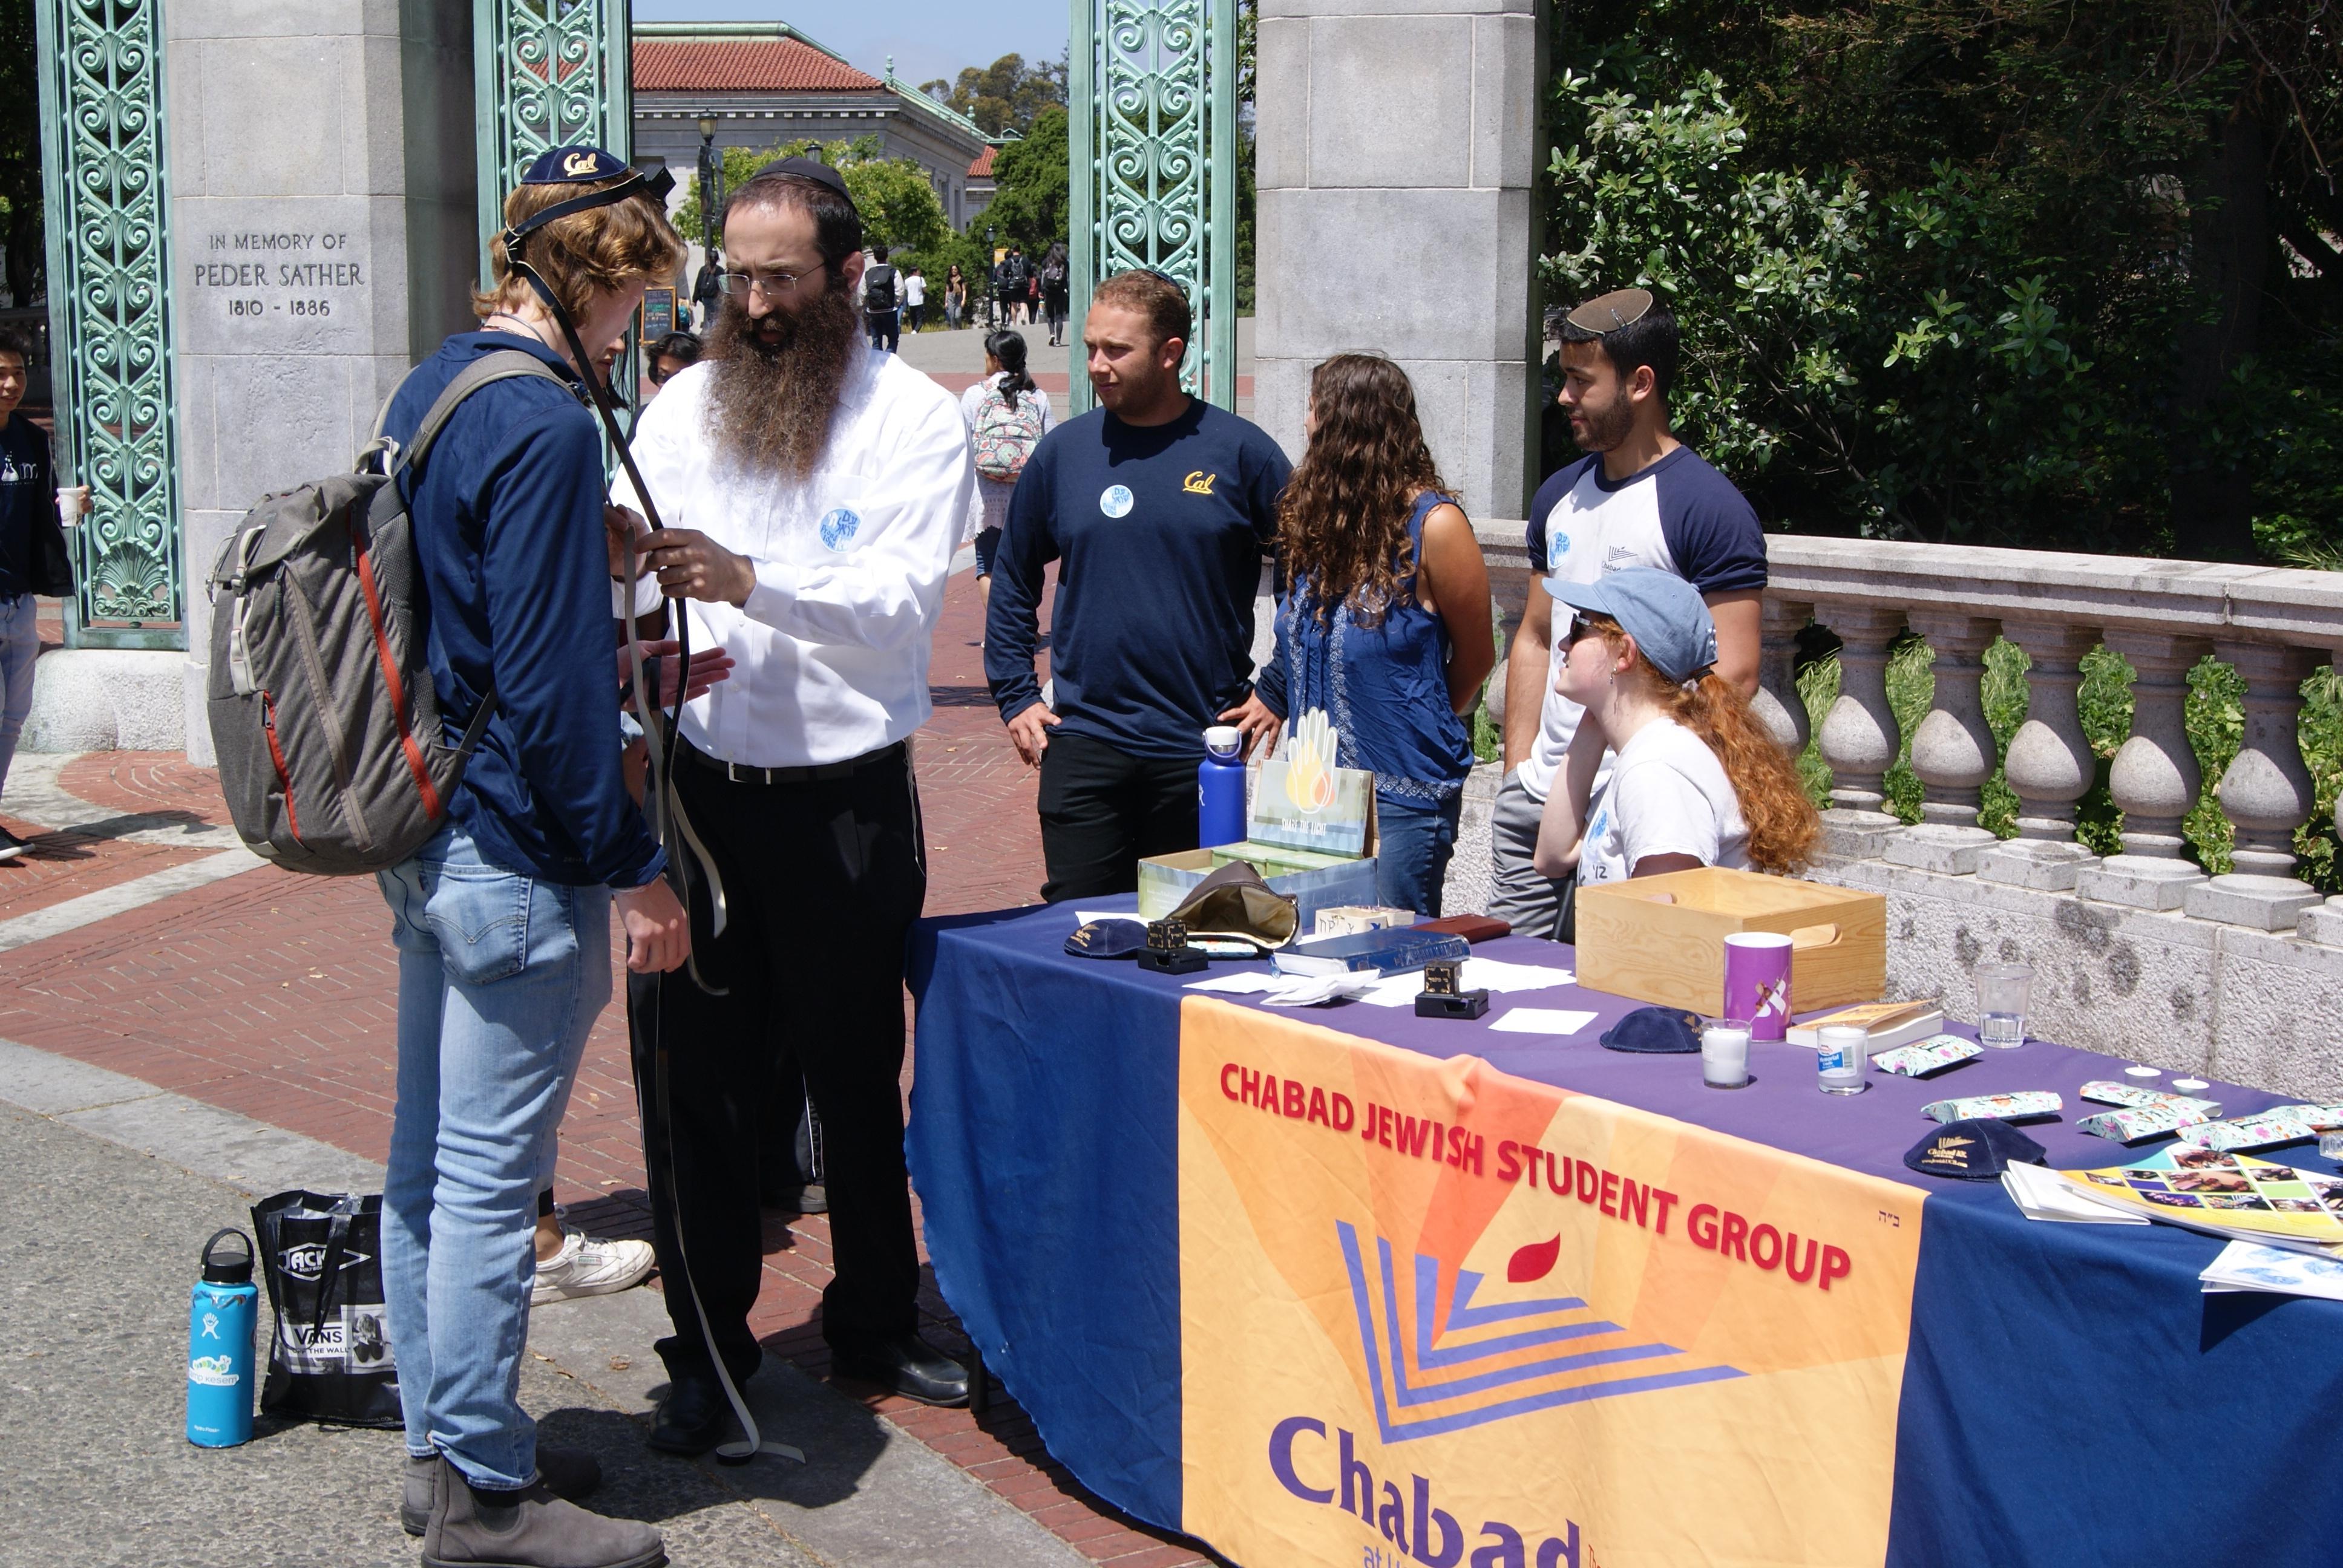 Rabbi Gil Leeds and UC Berkeley students do mitzvot to honor Poway shooting victim.